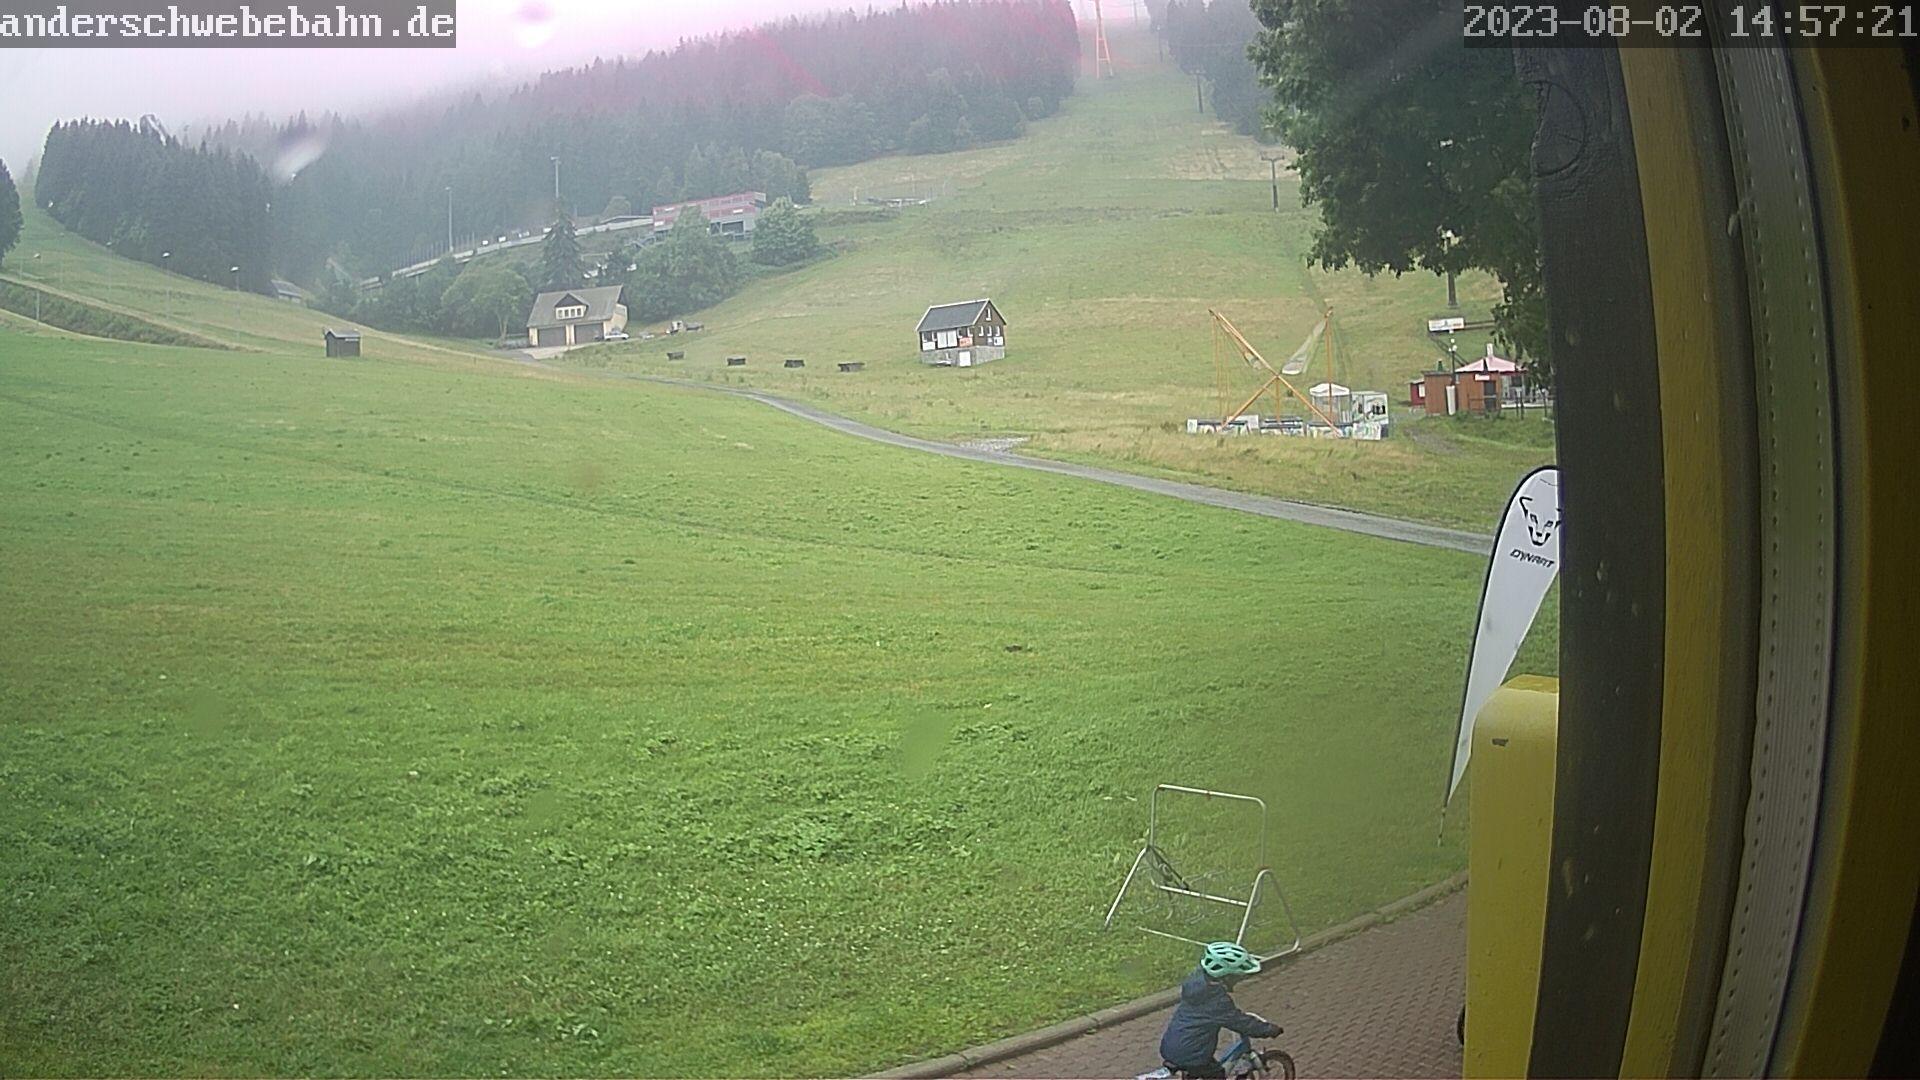 Webcam Fichtelberg Haus: Oberwiesenthaler Skigebiet